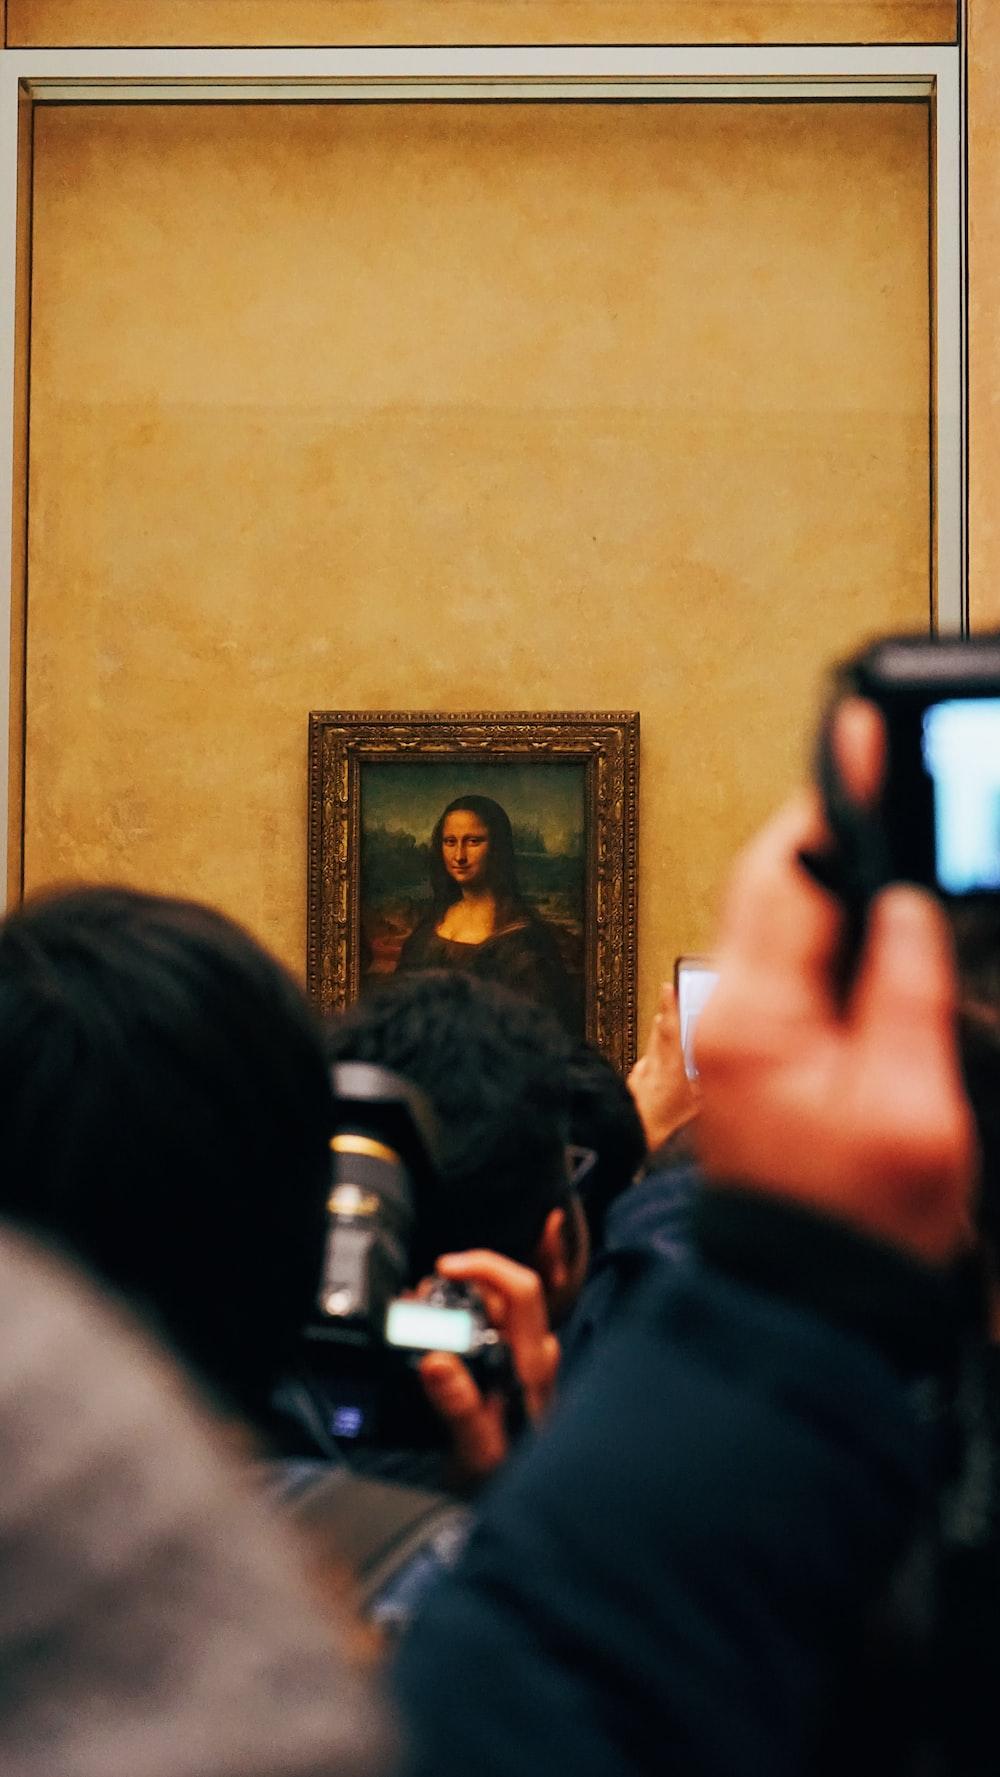 Mona Lisa by Leonardo Da Vinci painting